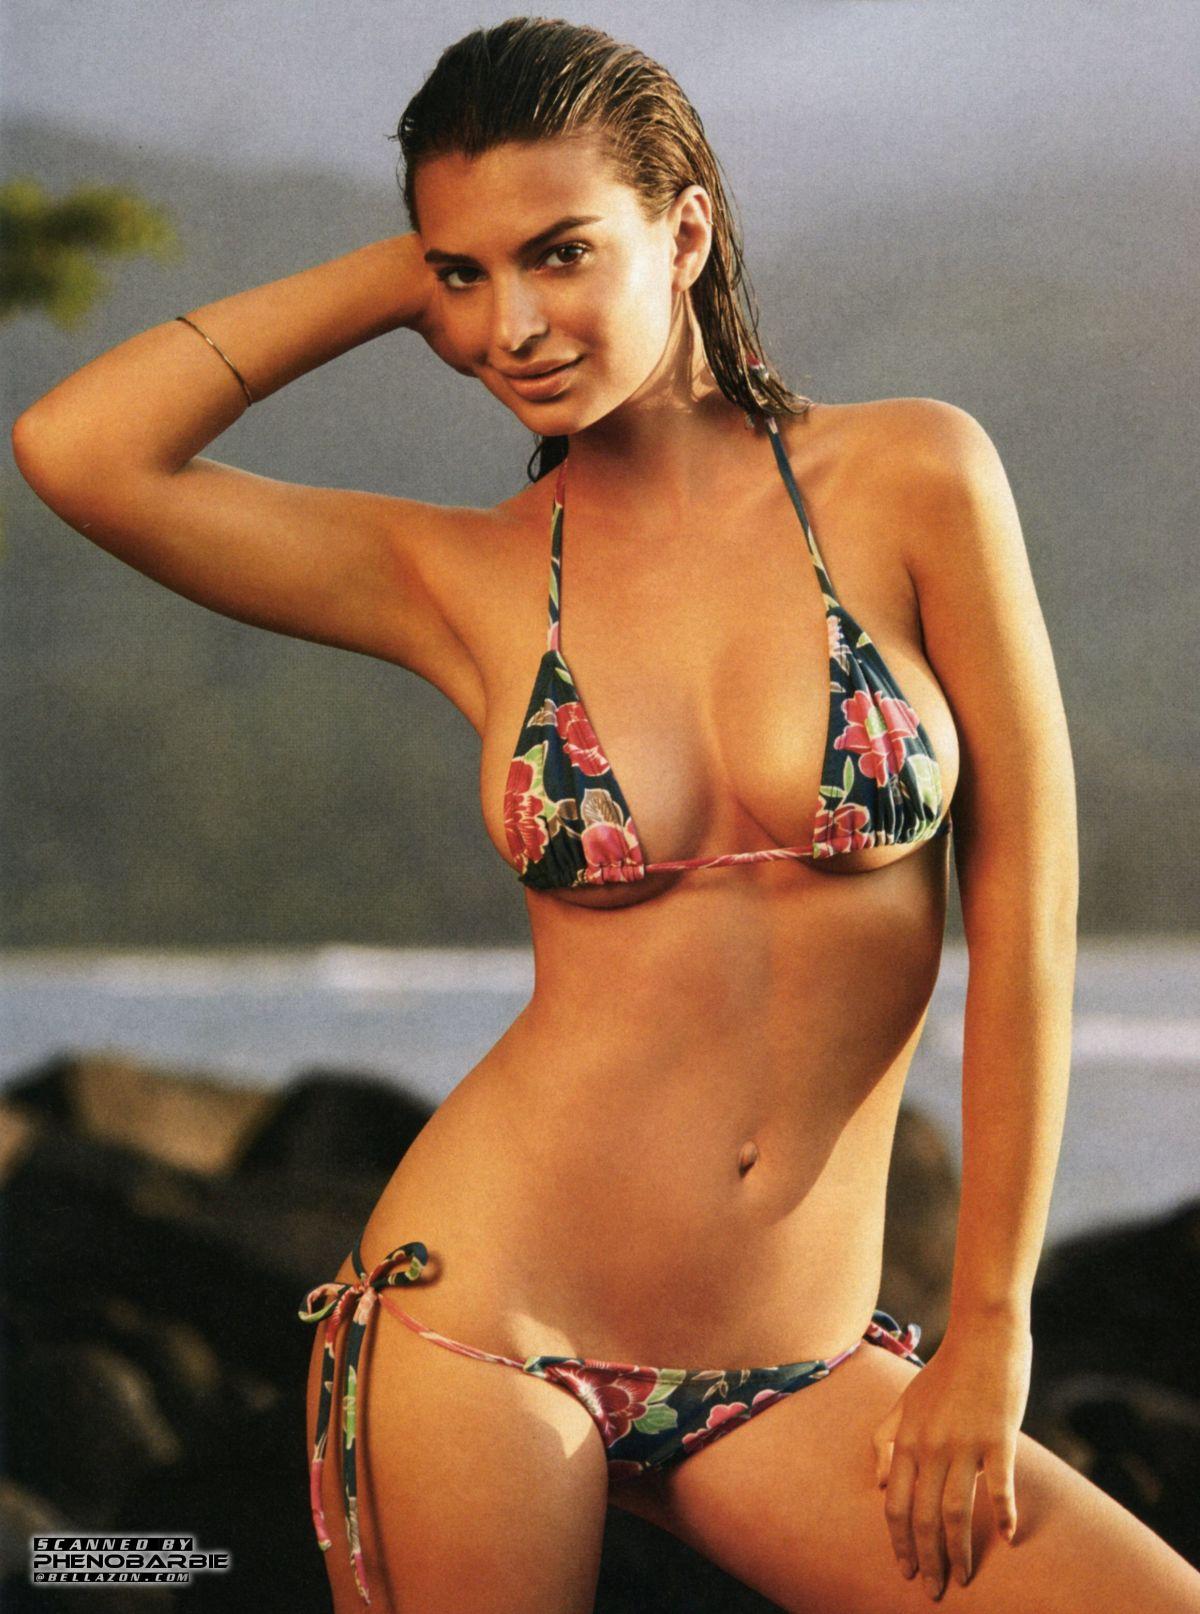 EMILY RATAJKOWSKI in Sports Illustrated Swimsuit 2015 Issue ...